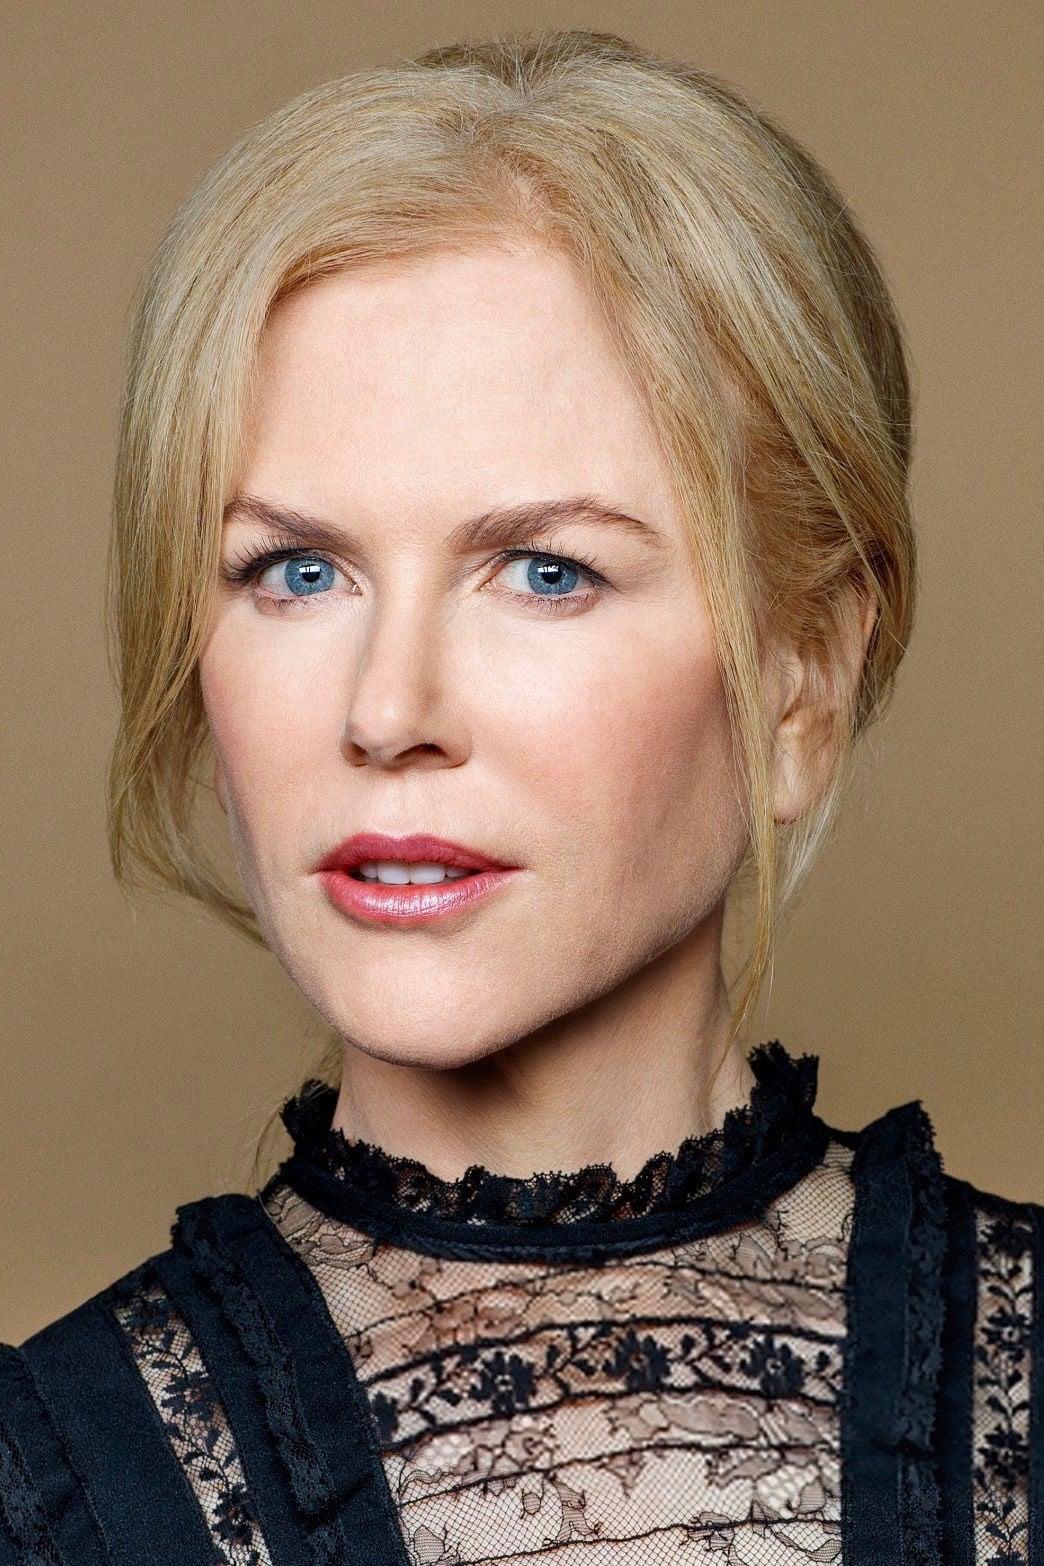 Nicole Kidman - Profile Images — The Movie Database (TMDb)